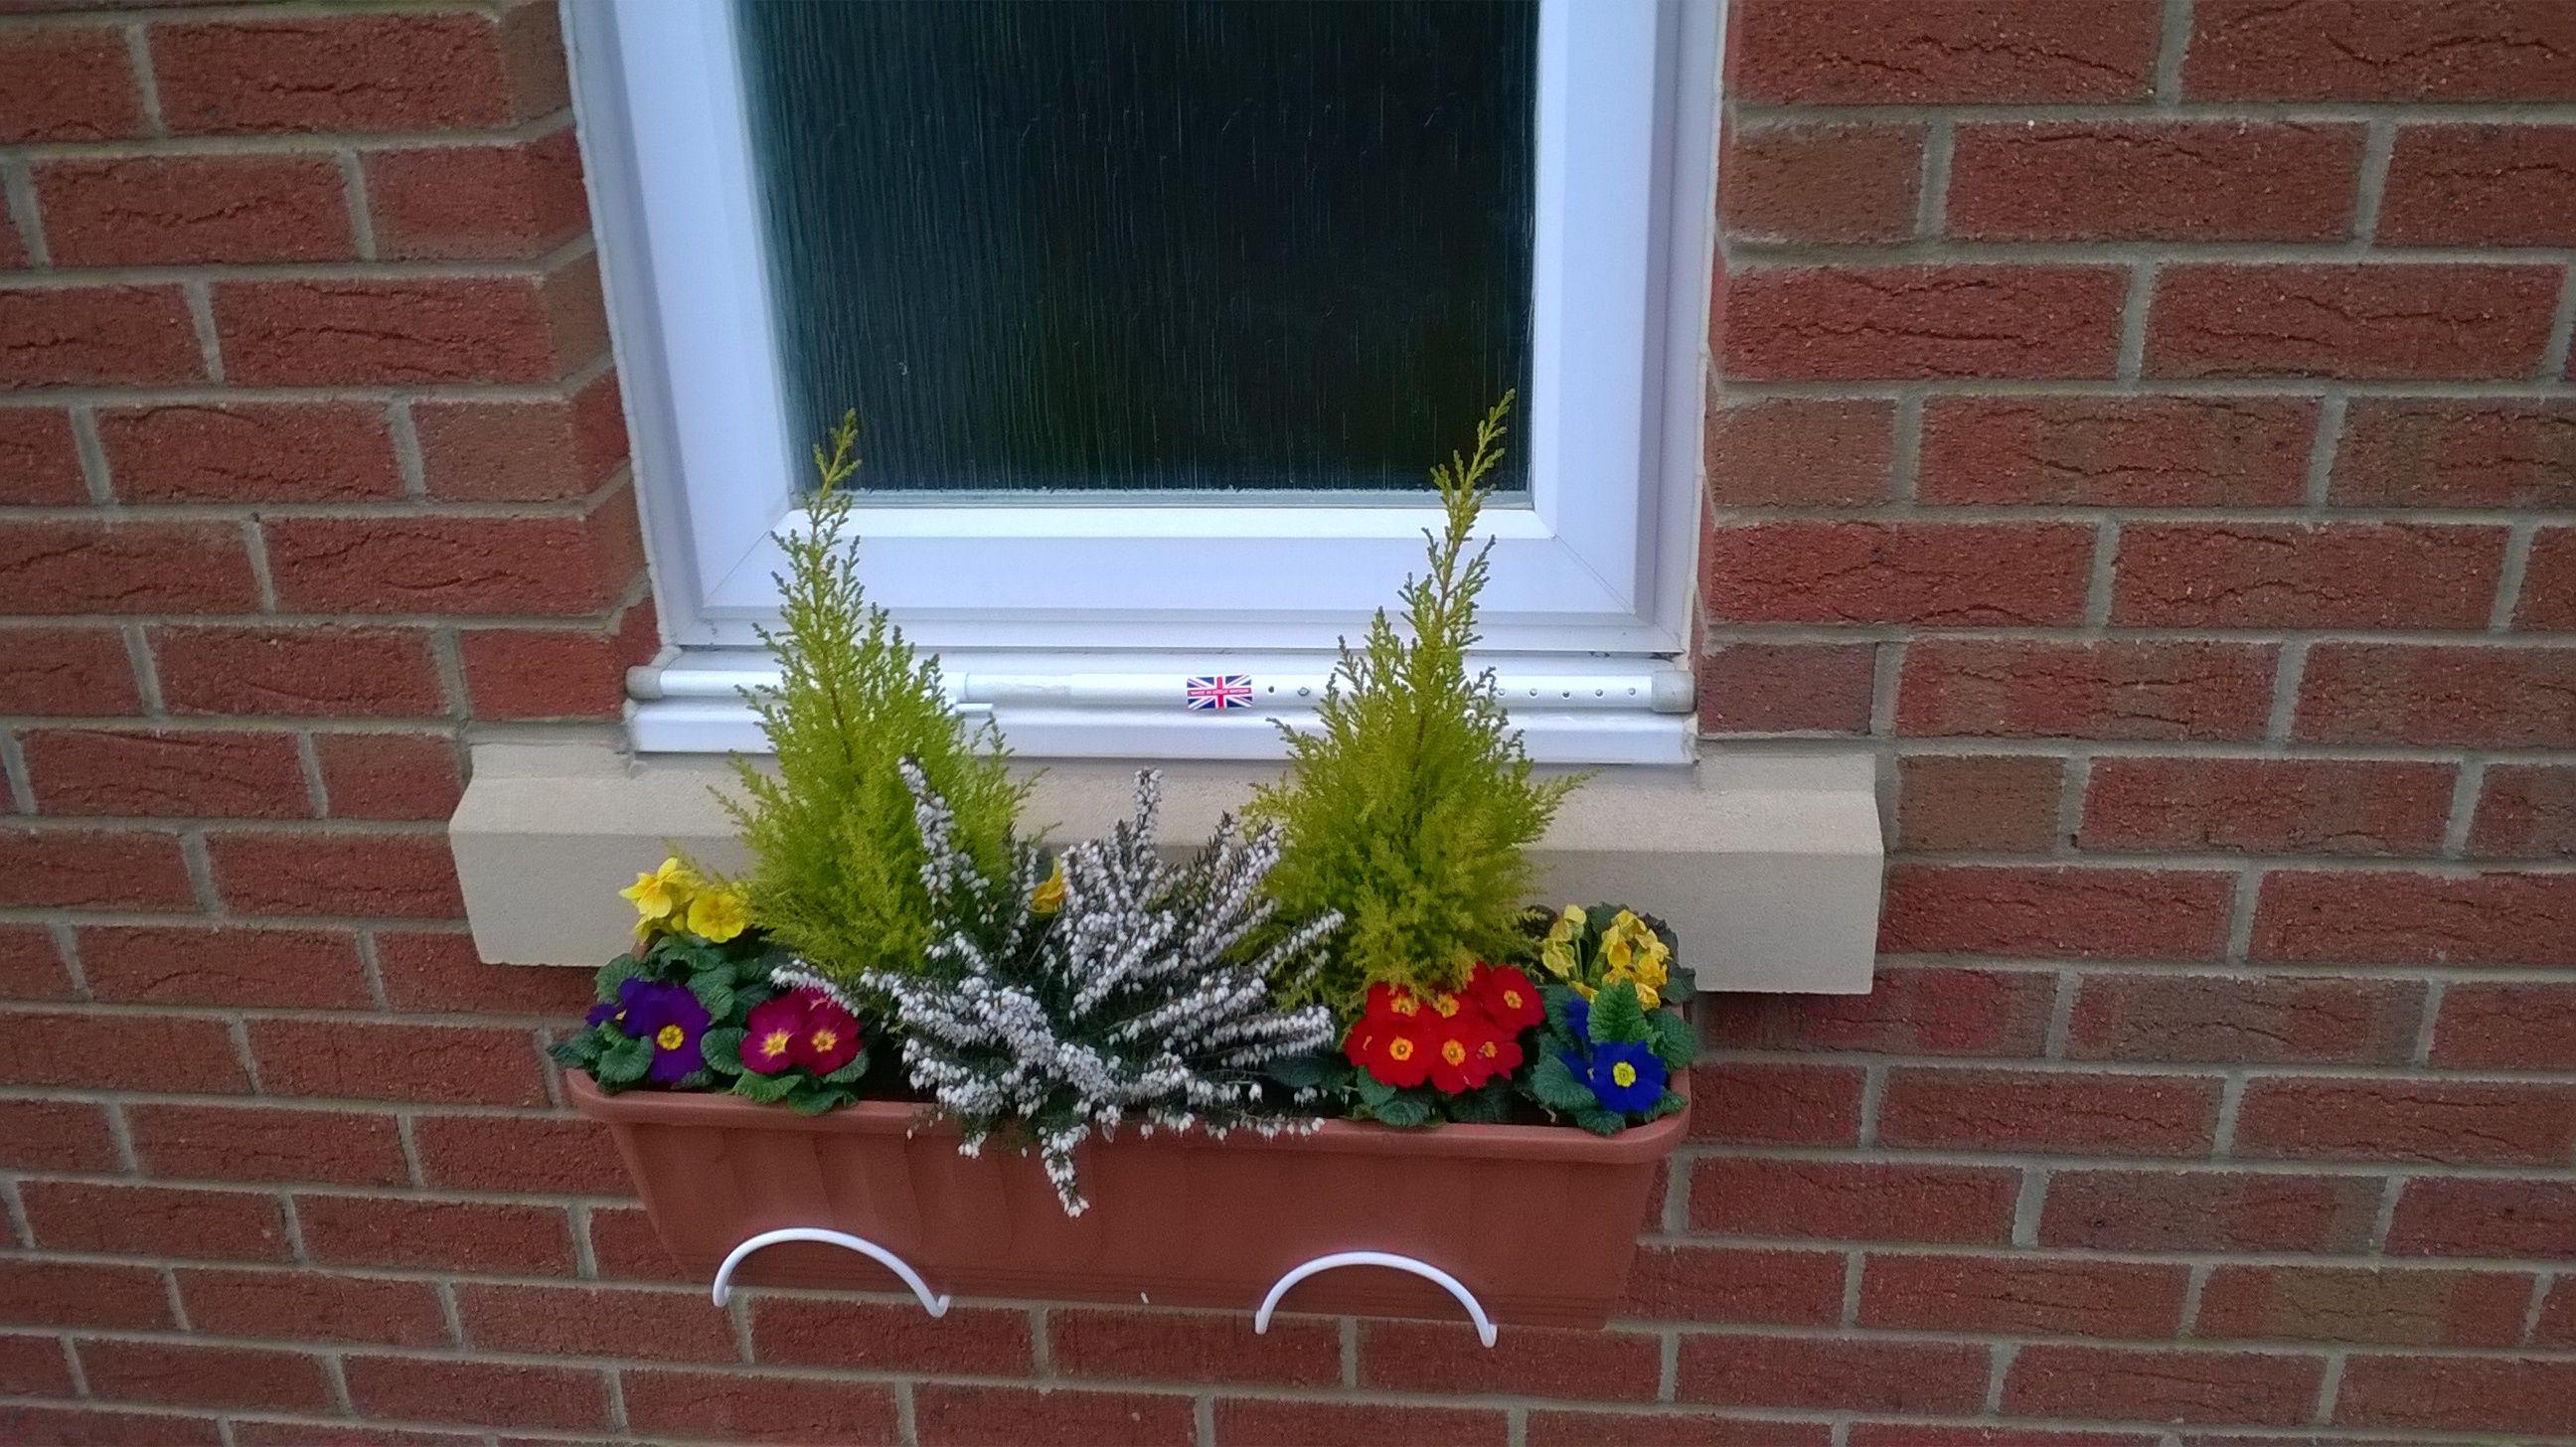 No Drill Window Box Www Ironforplants Co Uk Window Box Window Boxes Decor